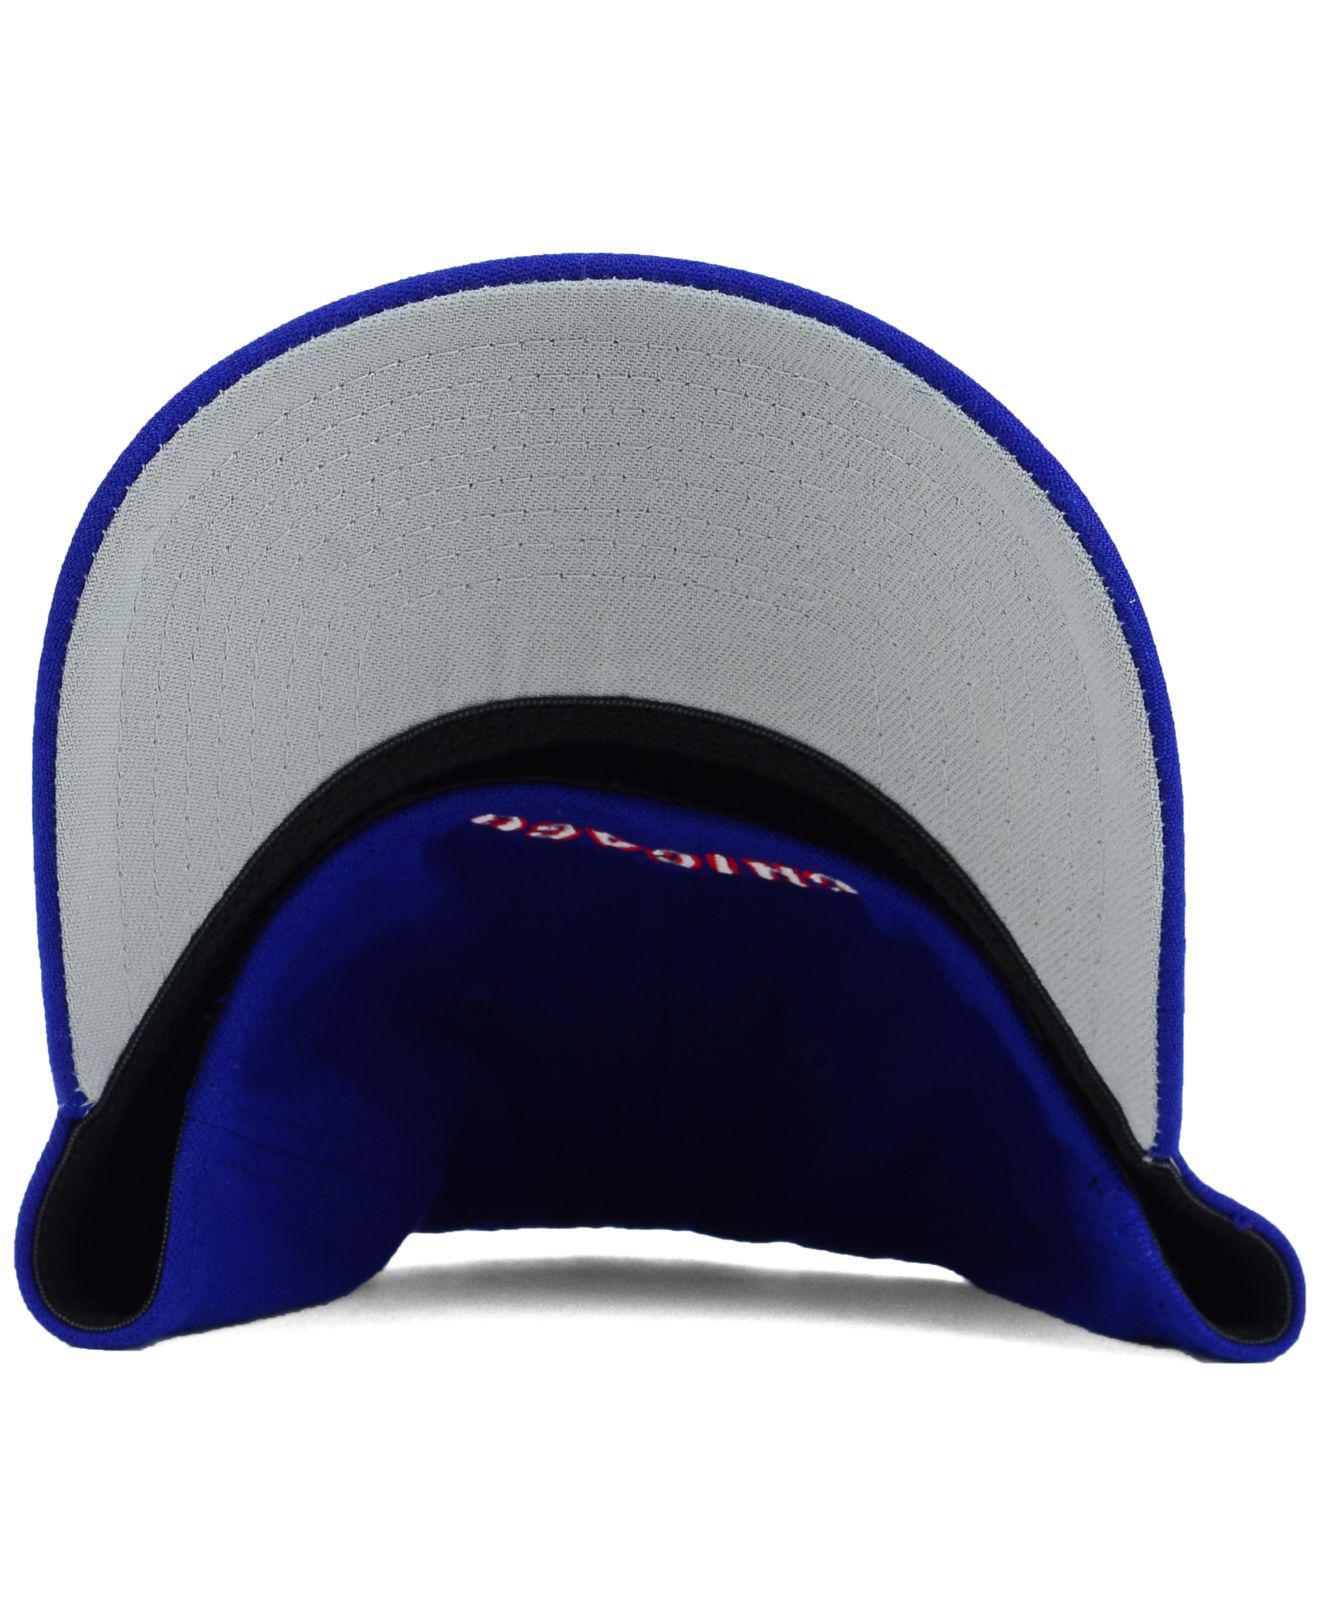 san francisco e75e4 2fa51 ... discount code for chicago cubs core classic 39thirty cap for men lyst. view  fullscreen aa511